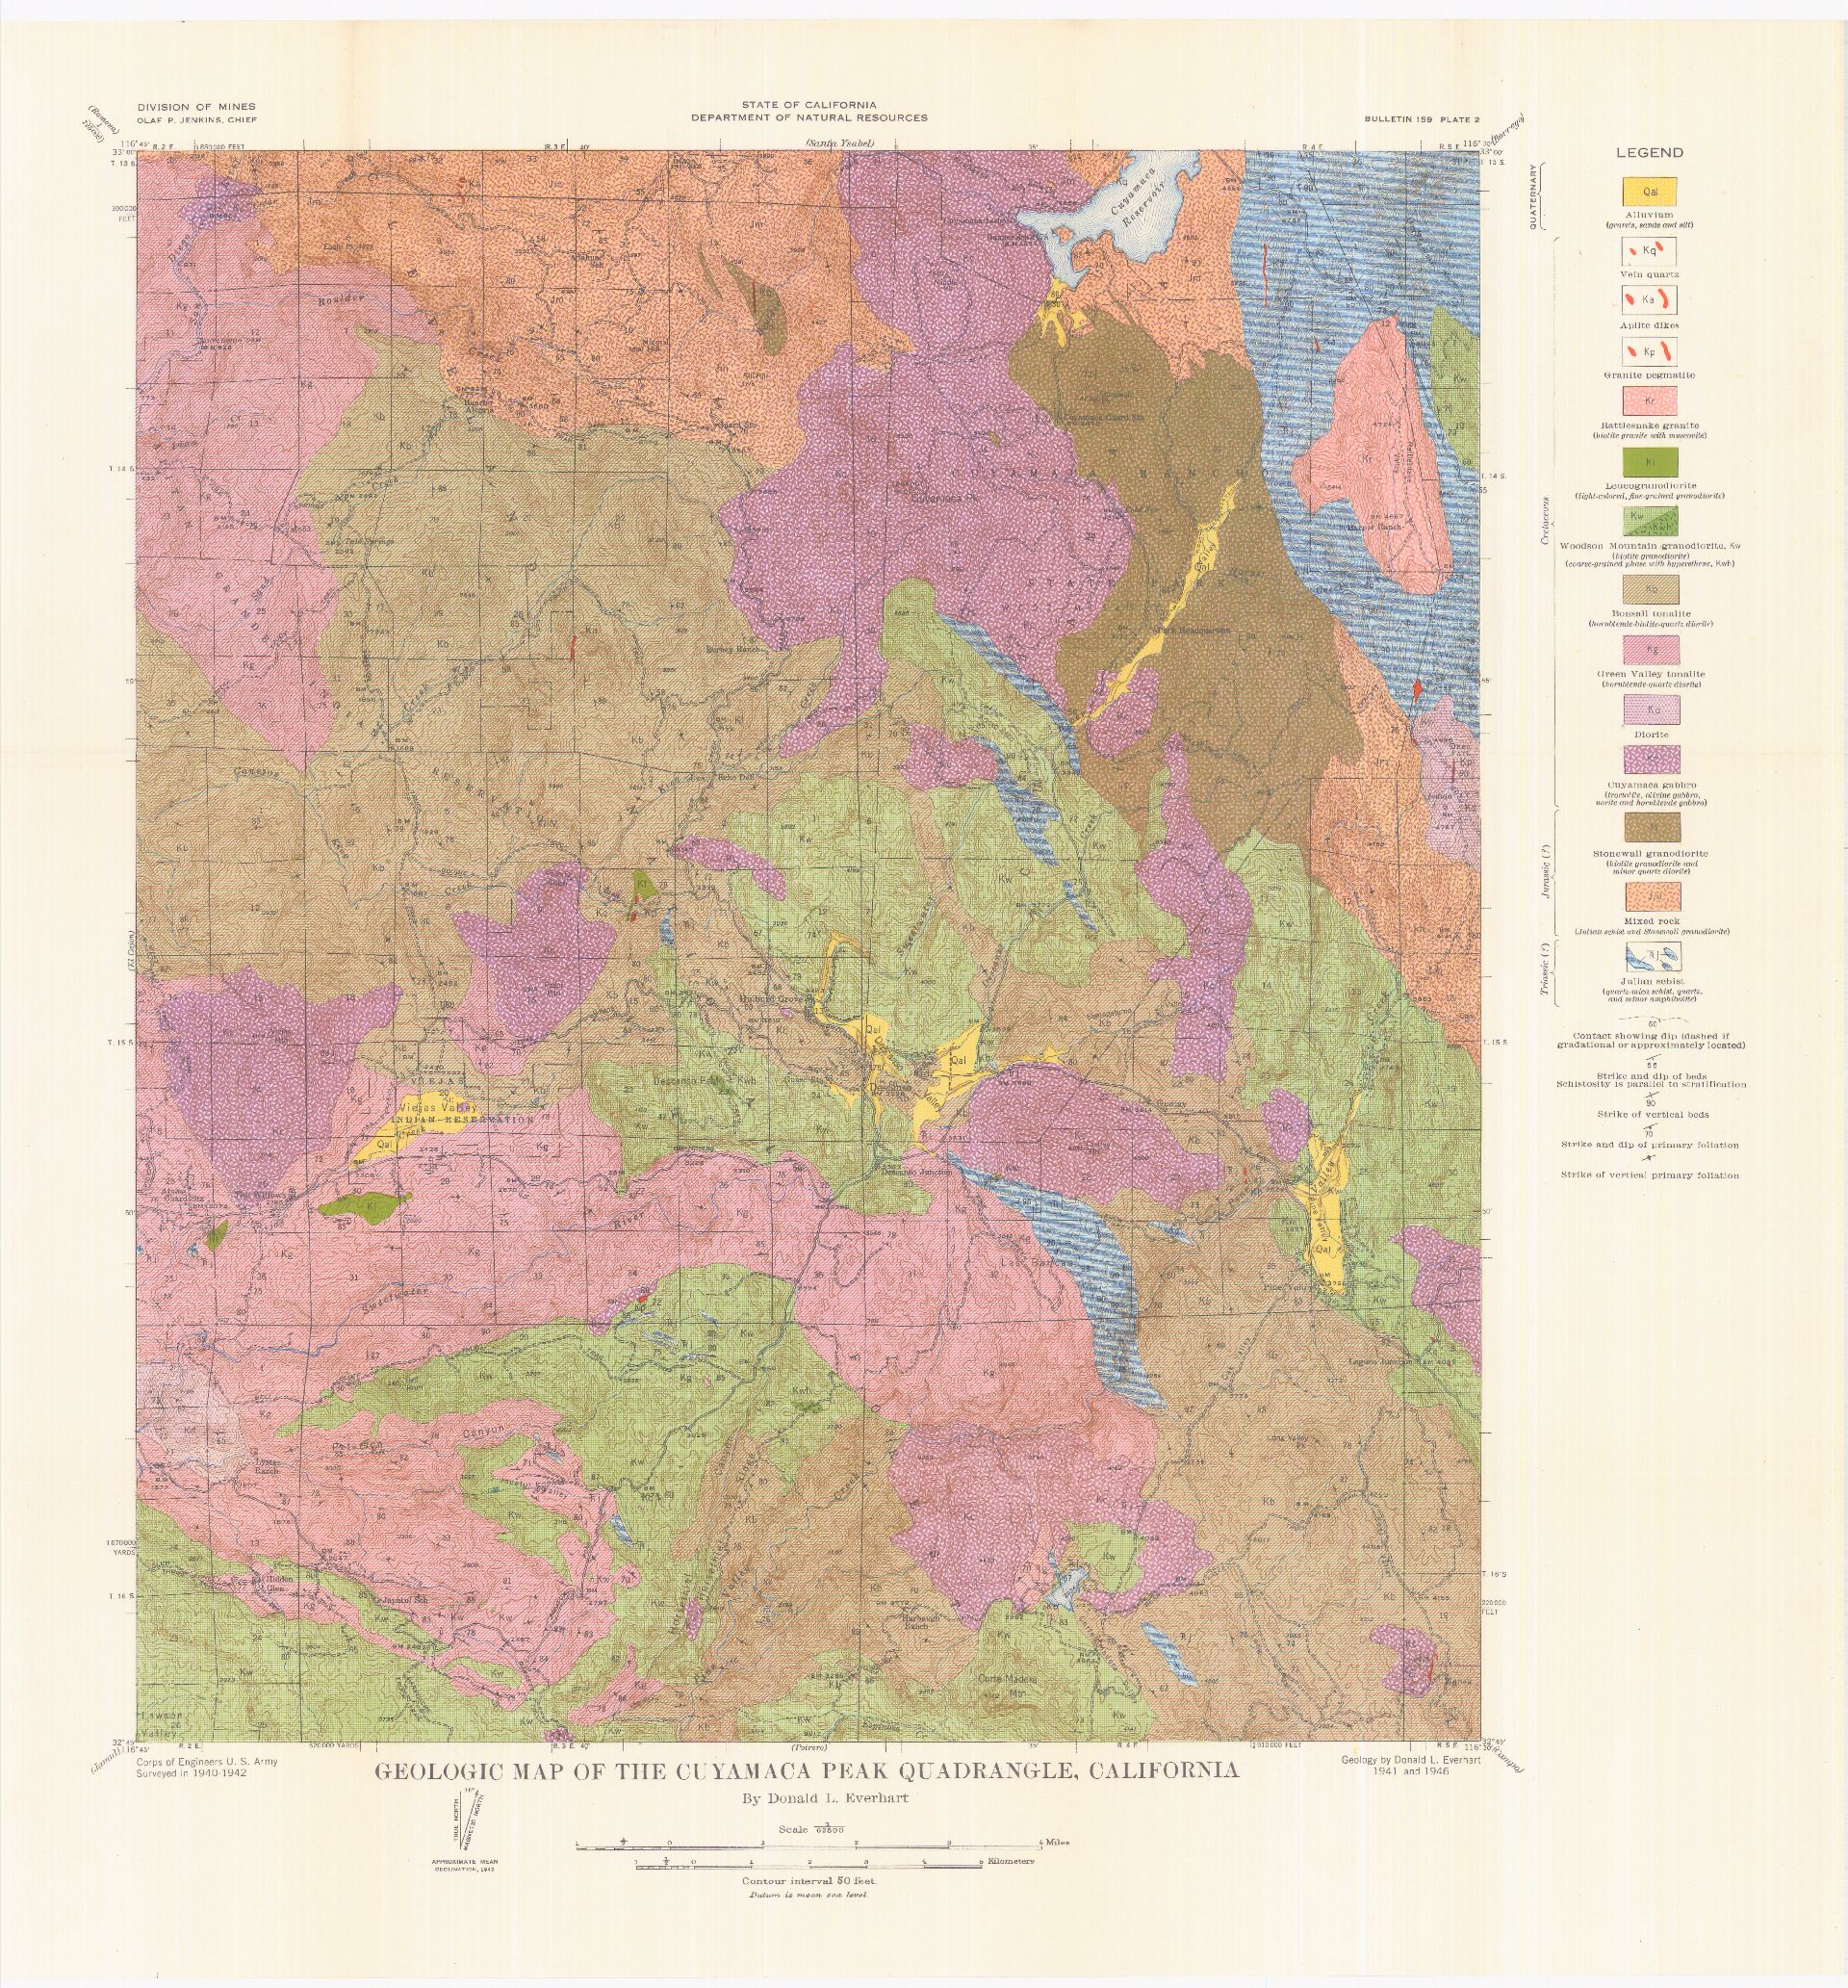 SDAG Online Historical Geological Maps San Diego County - California geologic map